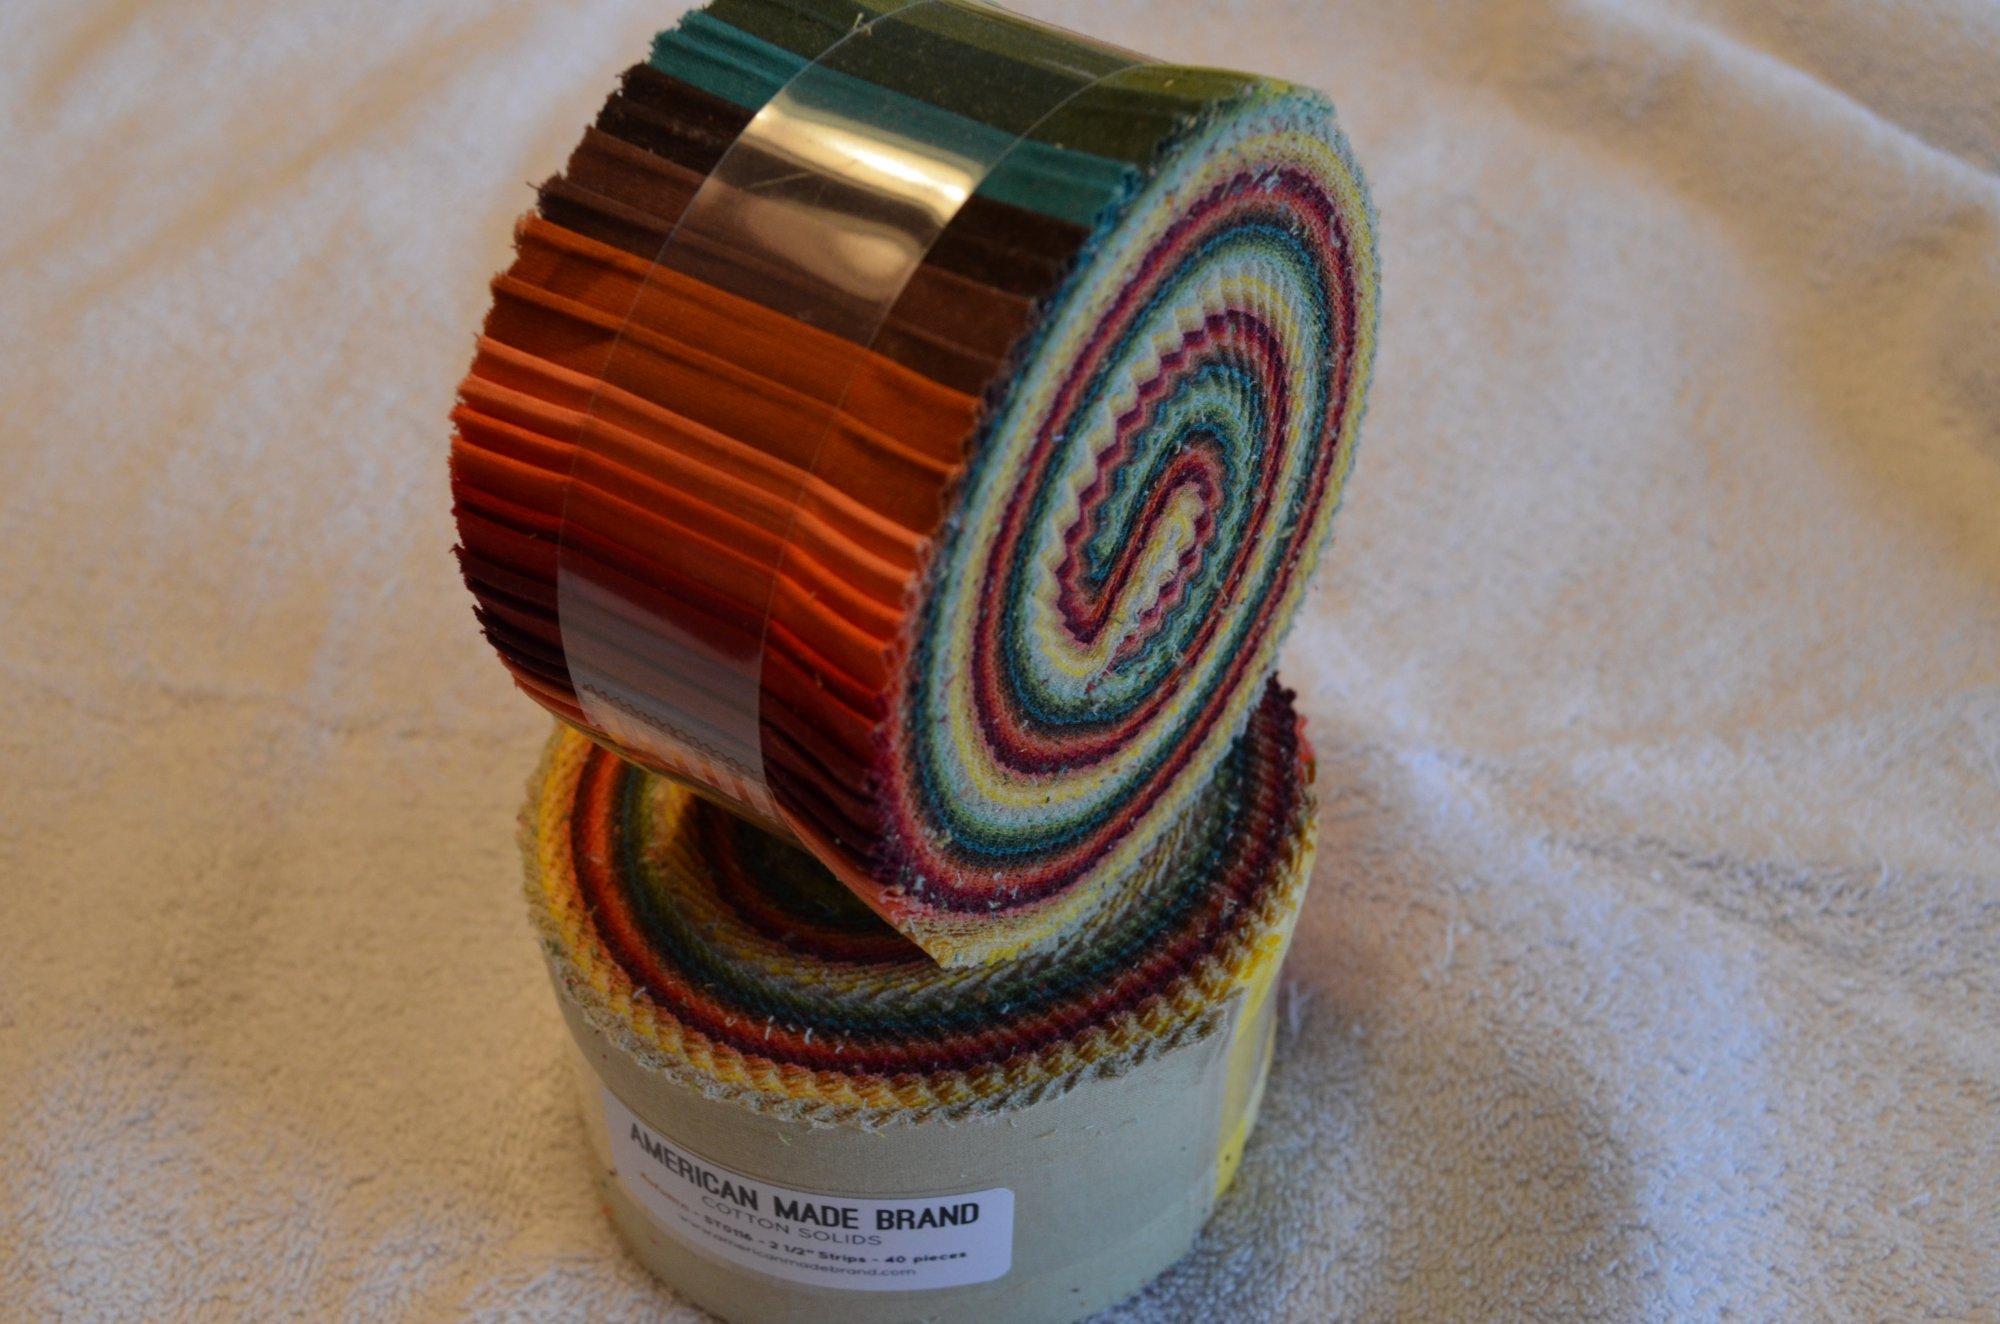 American Made Brand Strip Roll Autumn CLTST0116